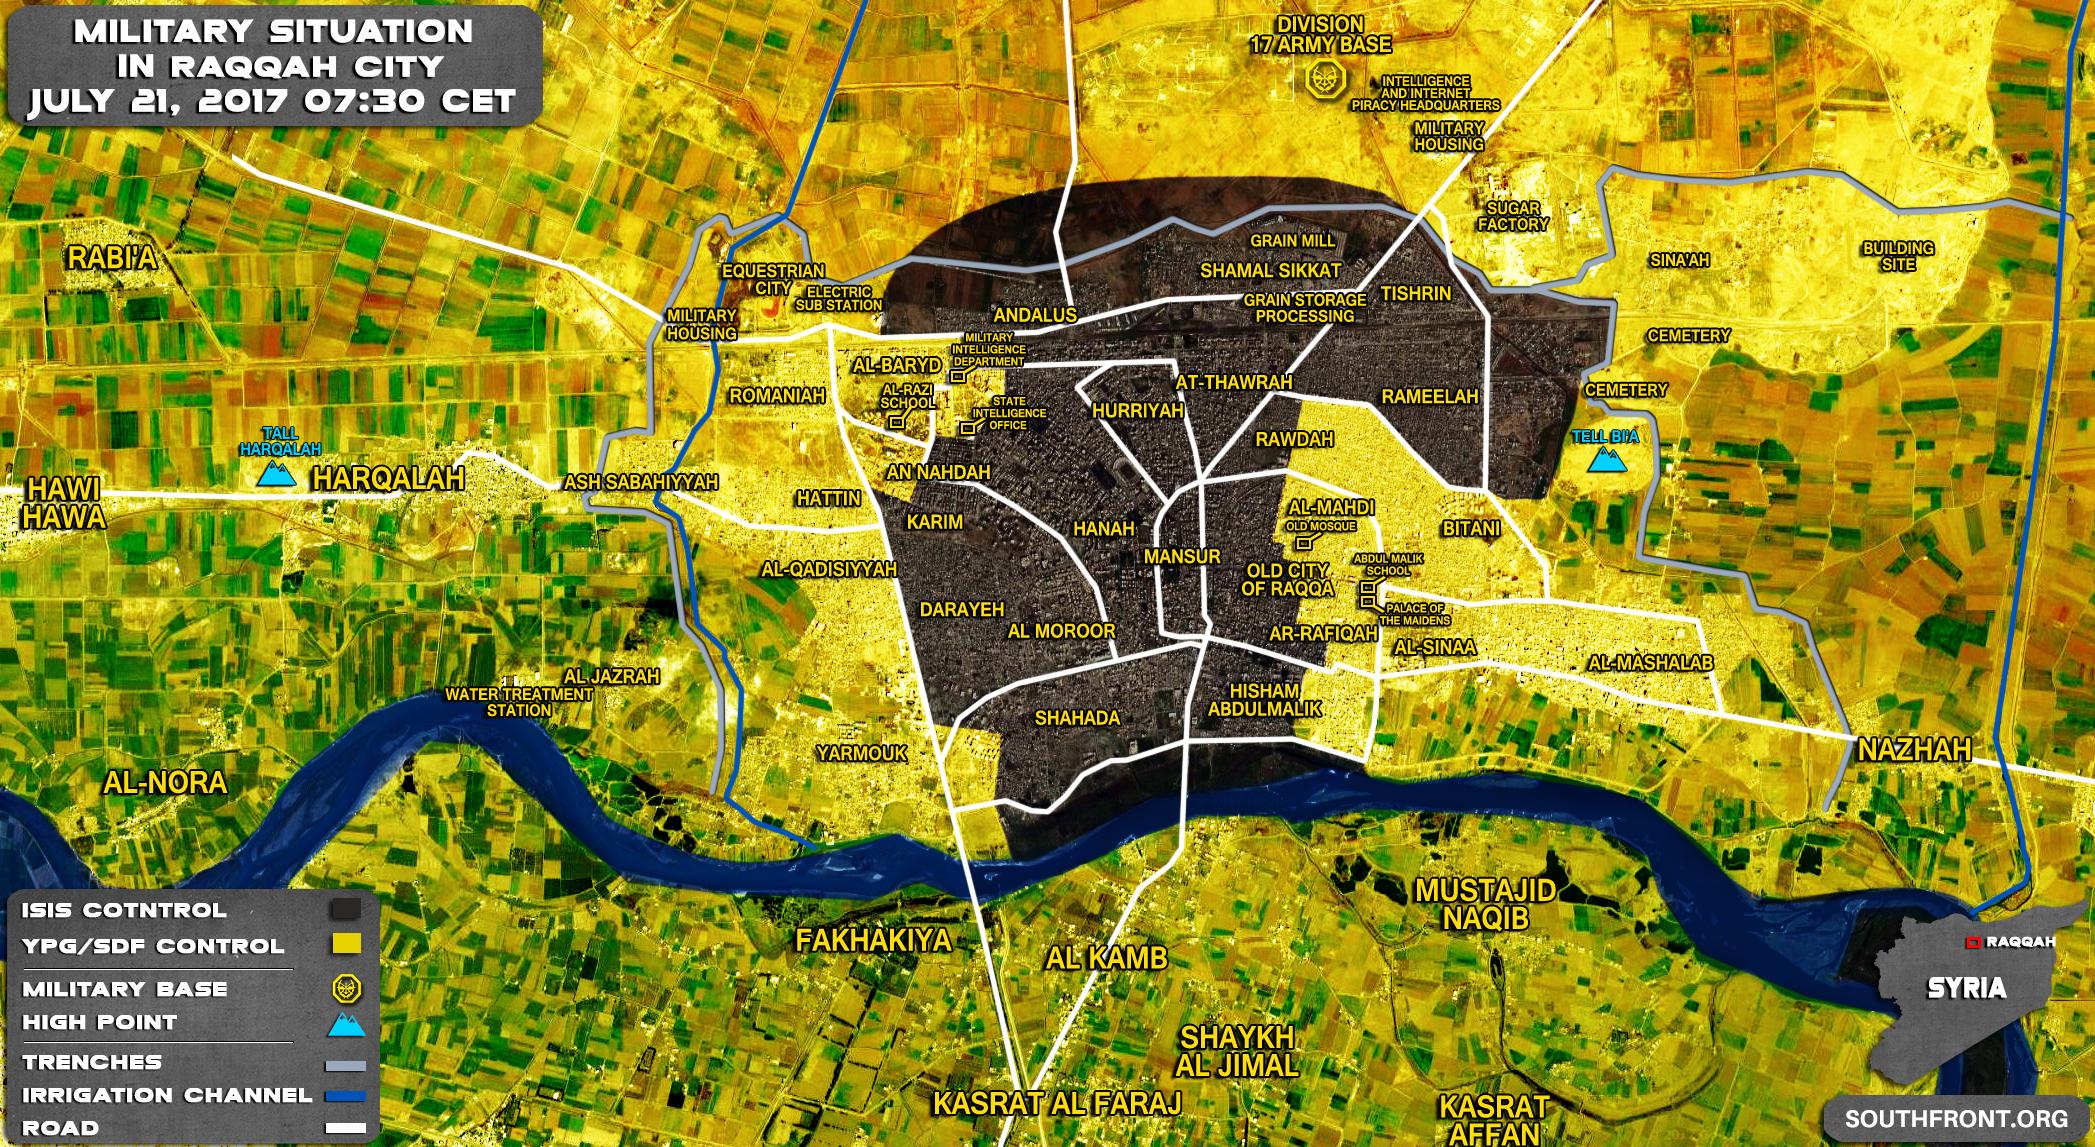 BREAKING - [BIZTPOL] Szíria és Irak - 6. - Page 18 21july_07_30_Raqqah_city_Syria_War_Map